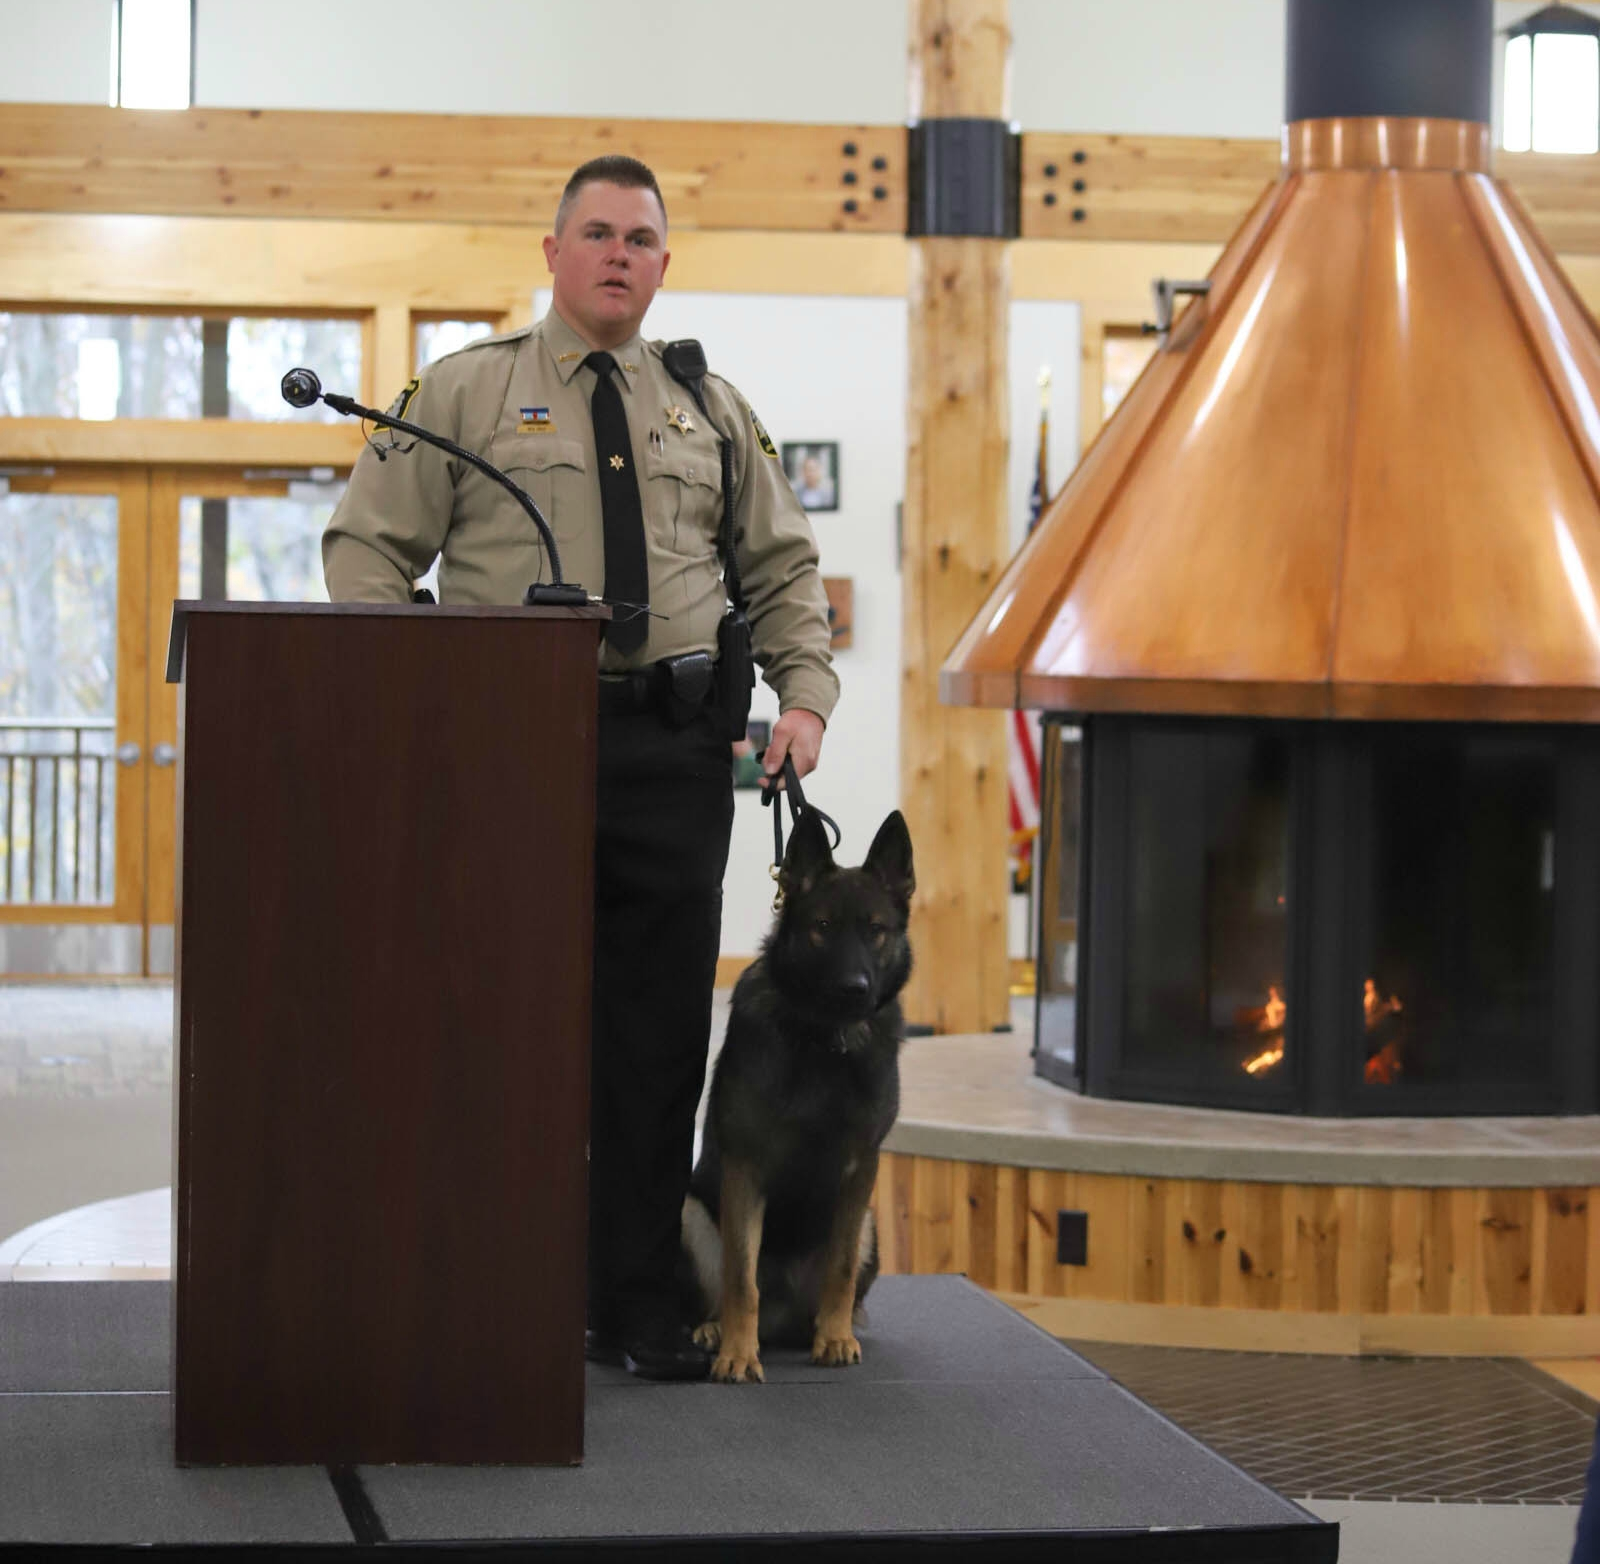 gun lake tribe allegan county sheriff's department donation